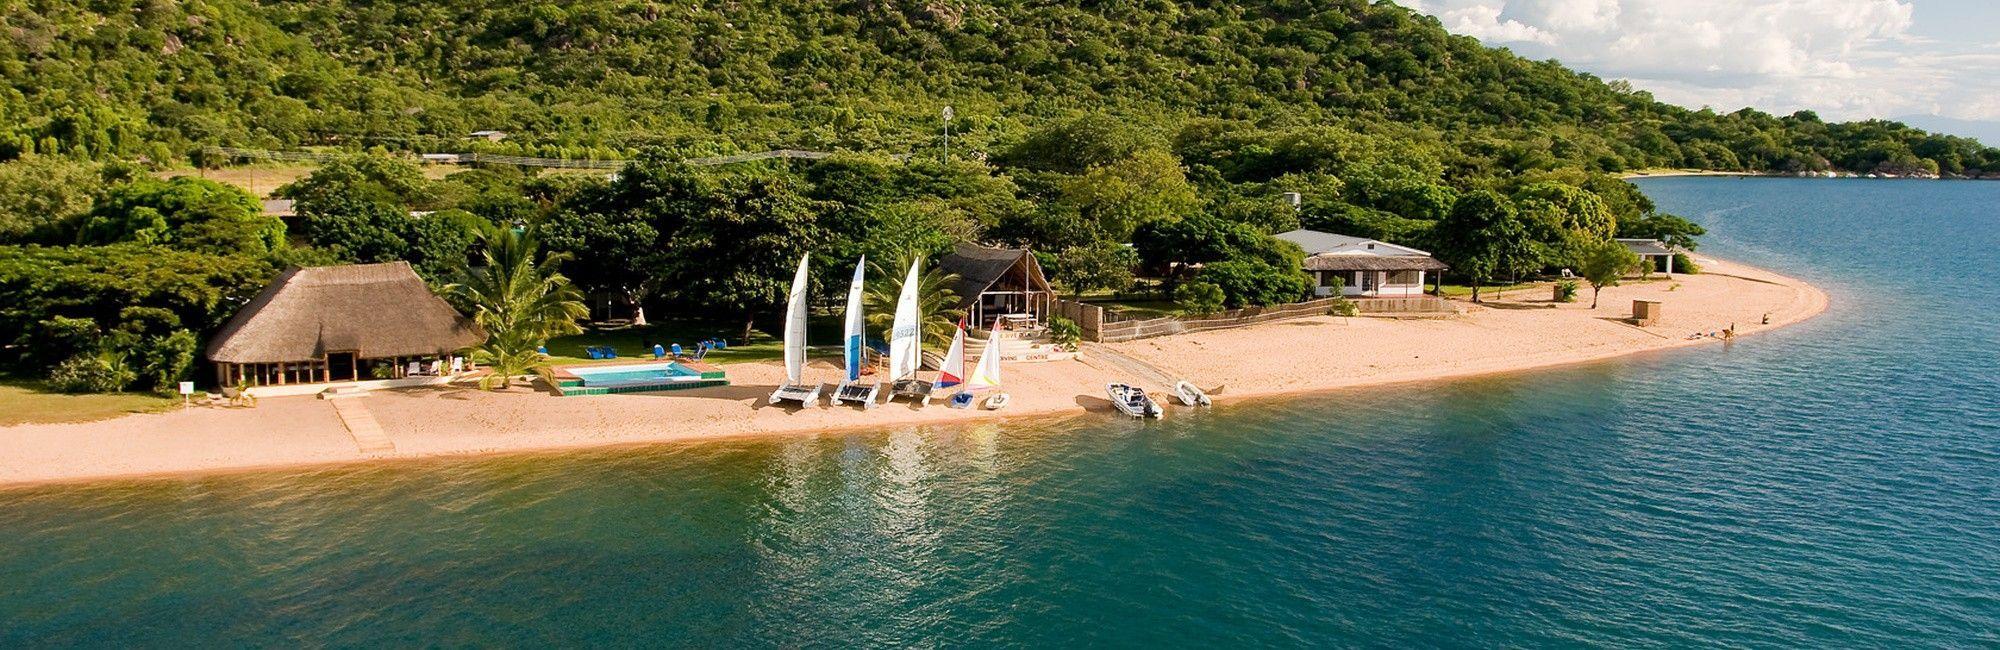 Malawi Strand Lake Malawi